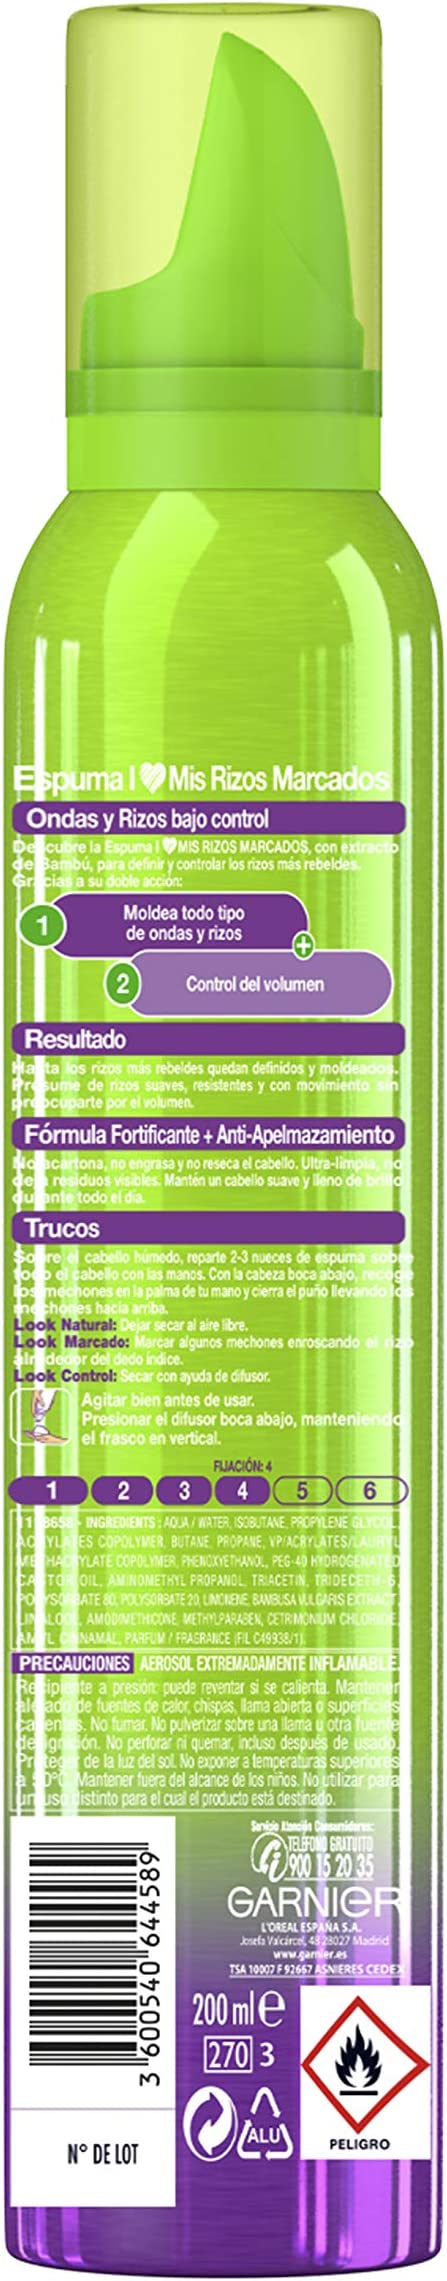 Garnier Fructis Style Espuma Big Volume Volumen XXL - 200 ml: Amazon.es: Belleza